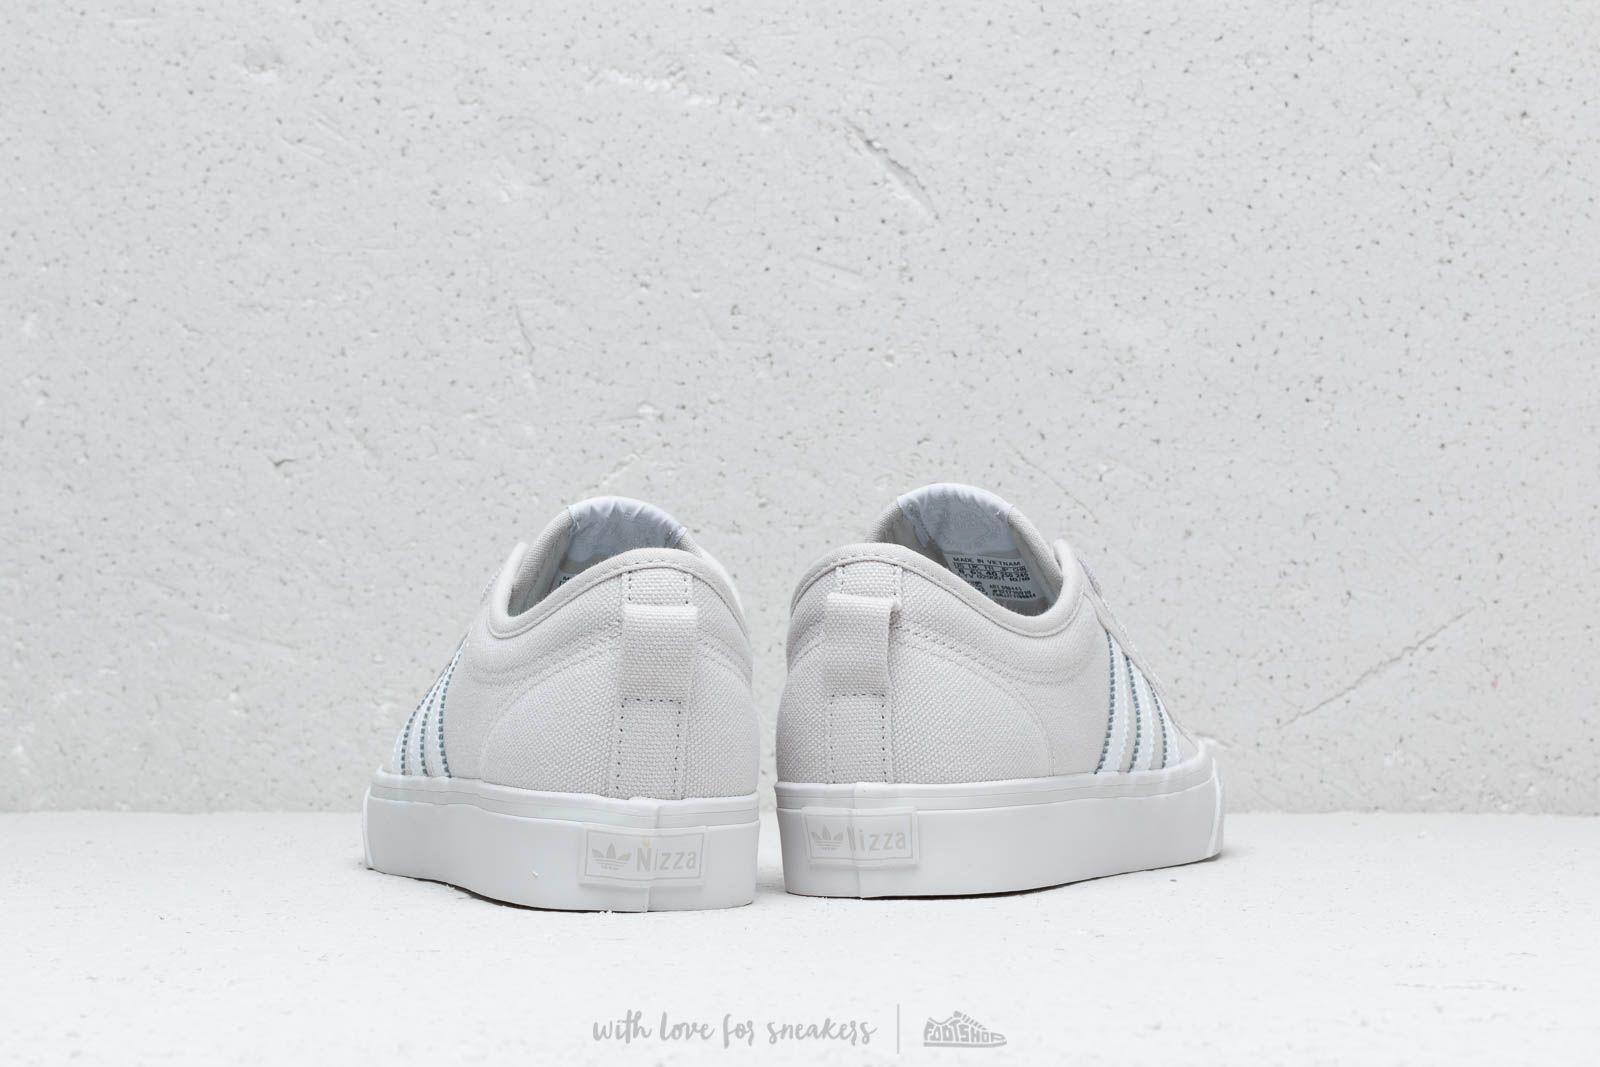 d1481e30bca adidas Nizza W Grey One  Ftw White  Crystal White a muy buen precio 67